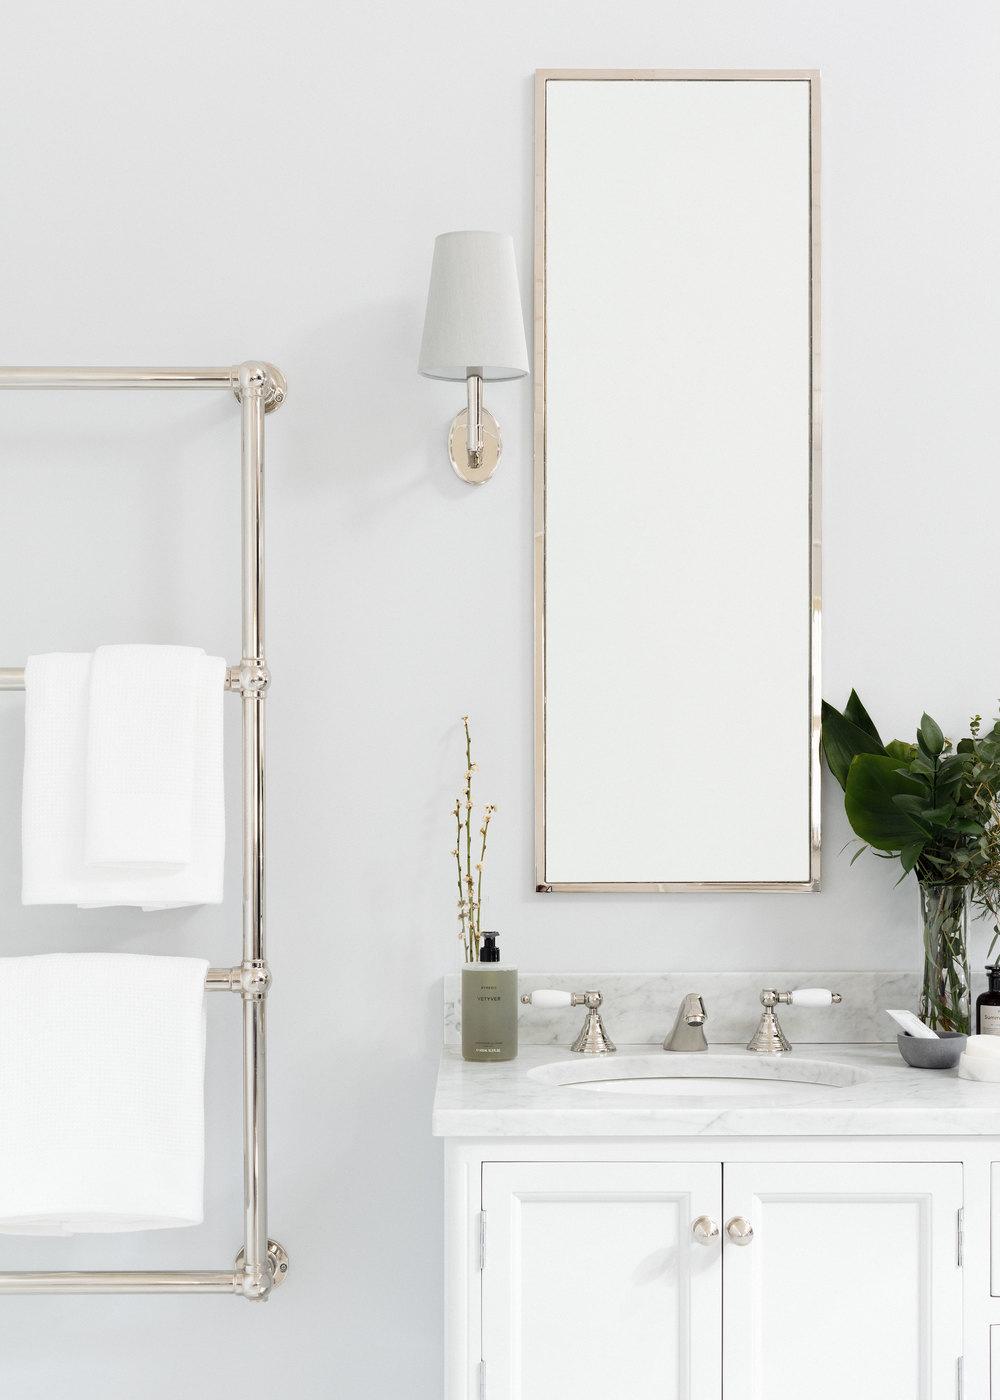 Porter_bathroom_vanities_the_Chester_02.jpg